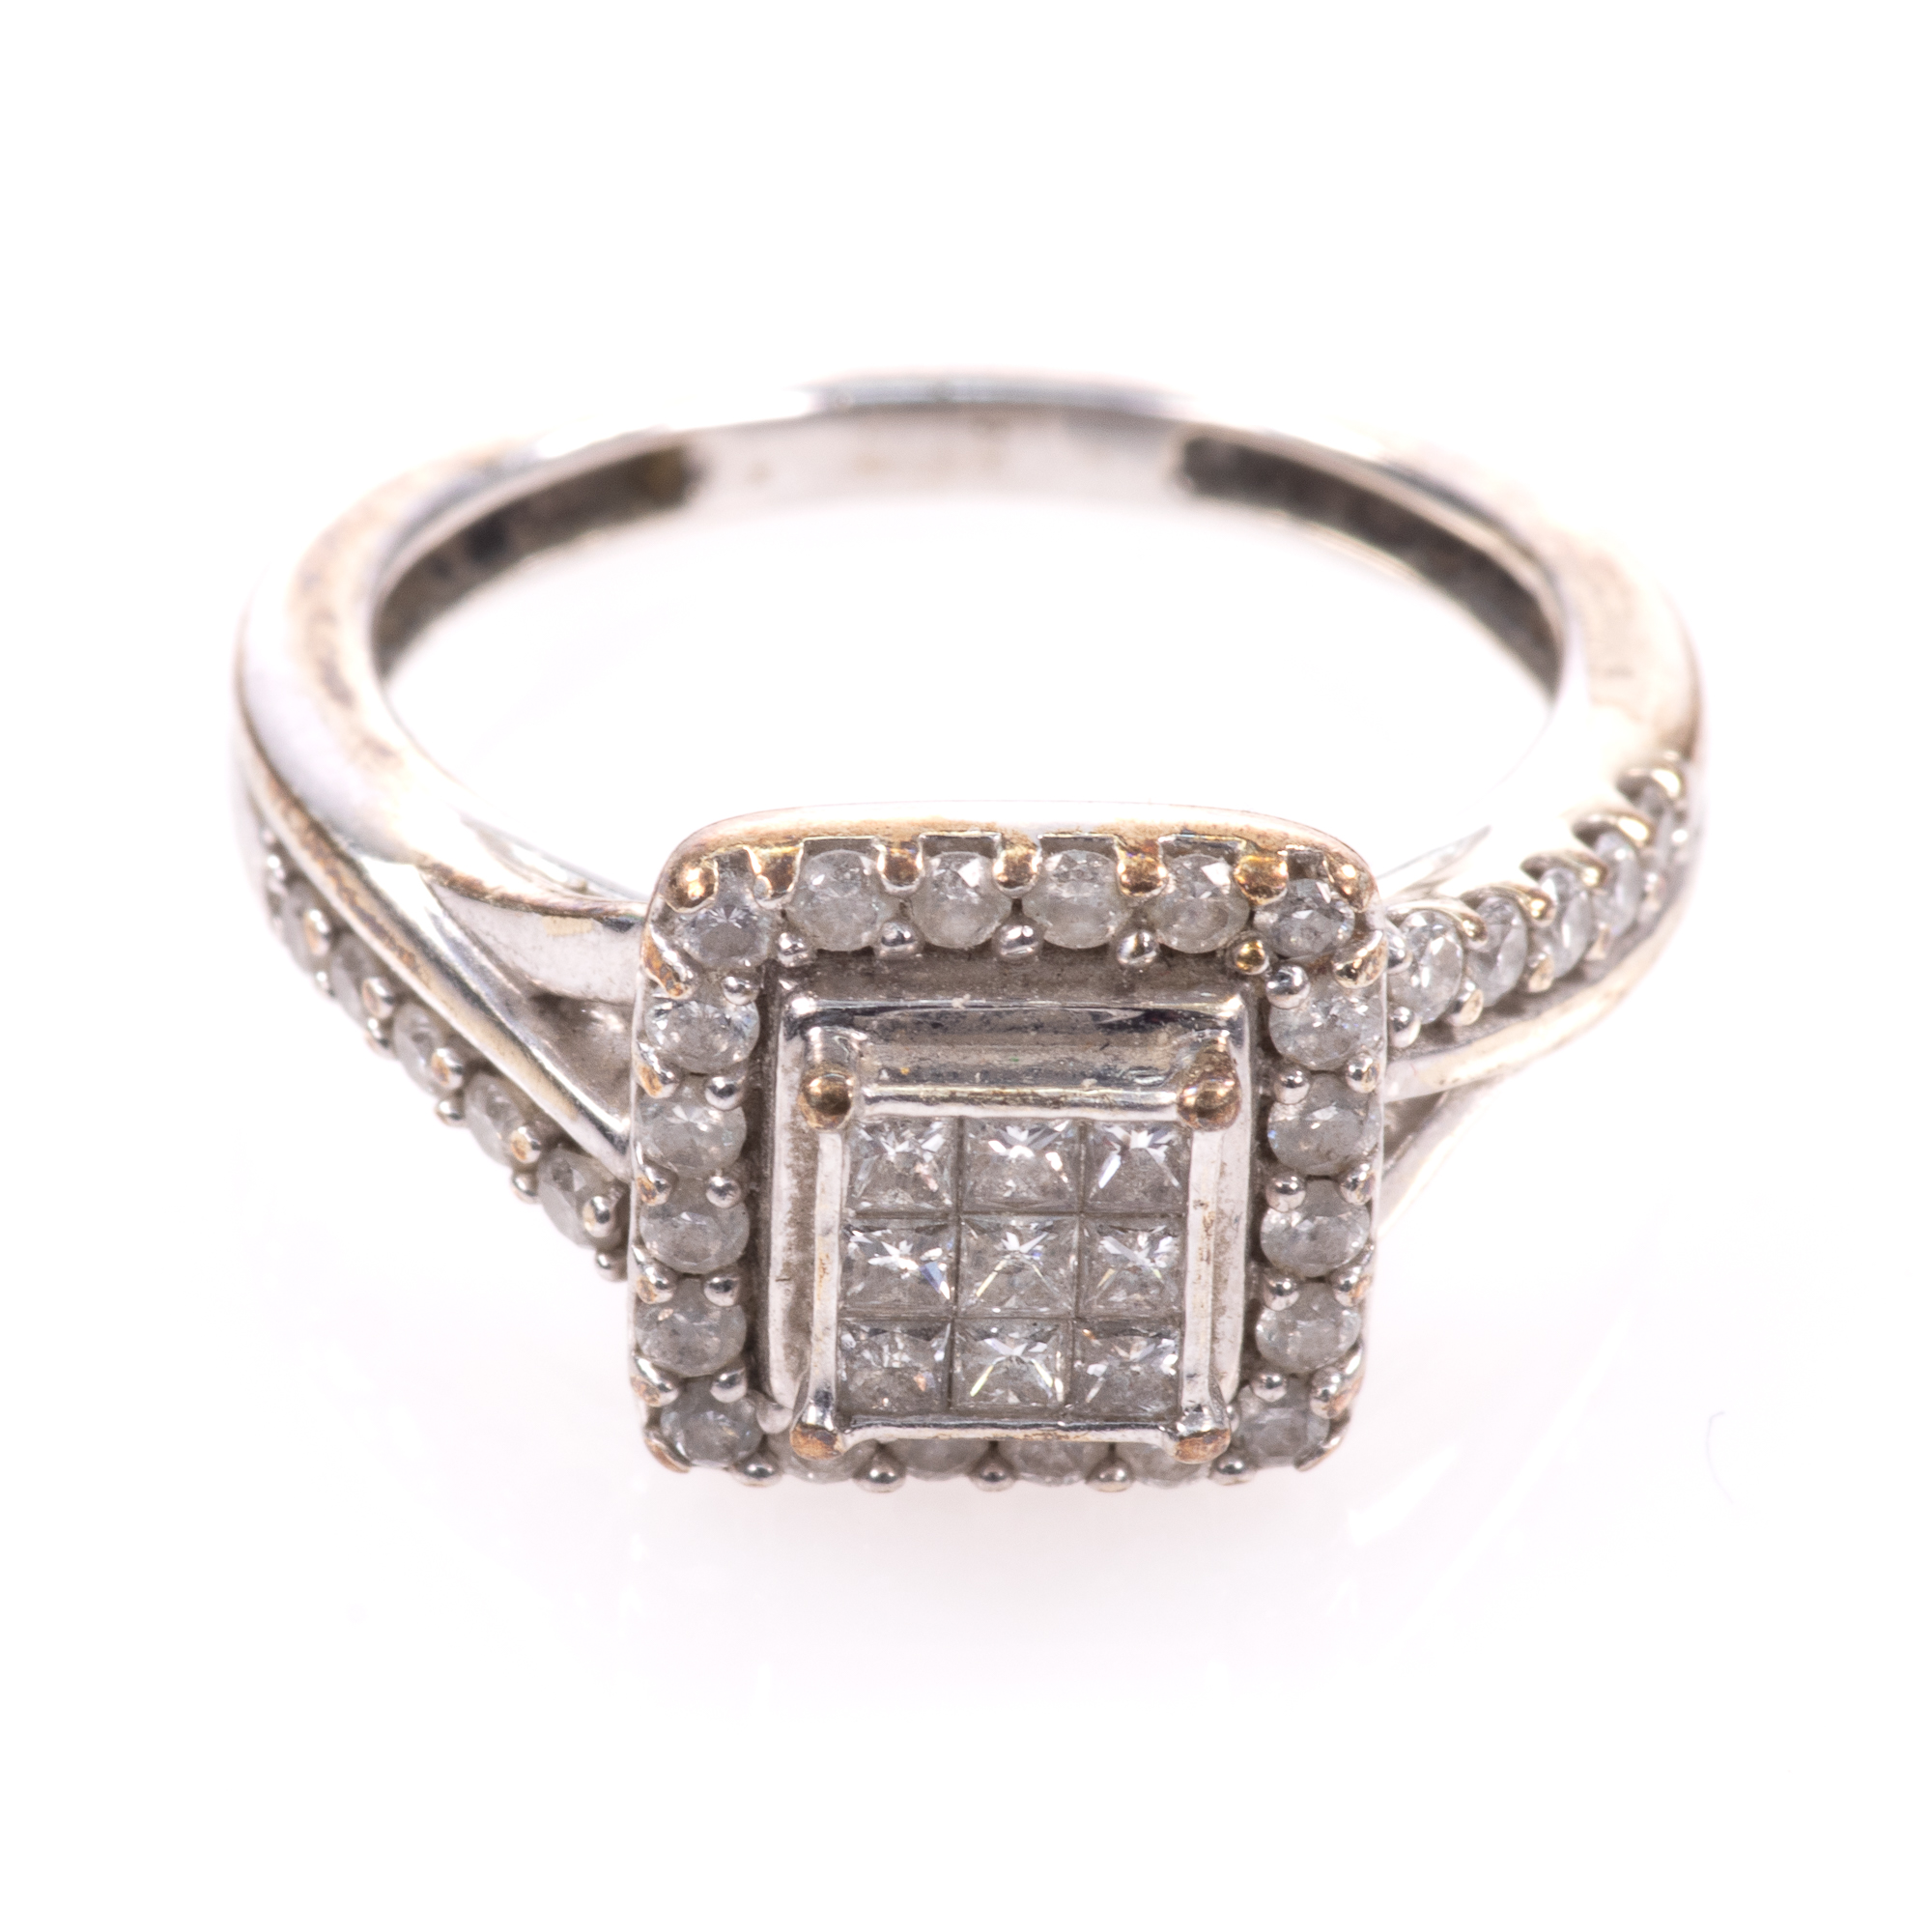 9ct White Gold 0.40ct Diamond Ring - Image 3 of 6